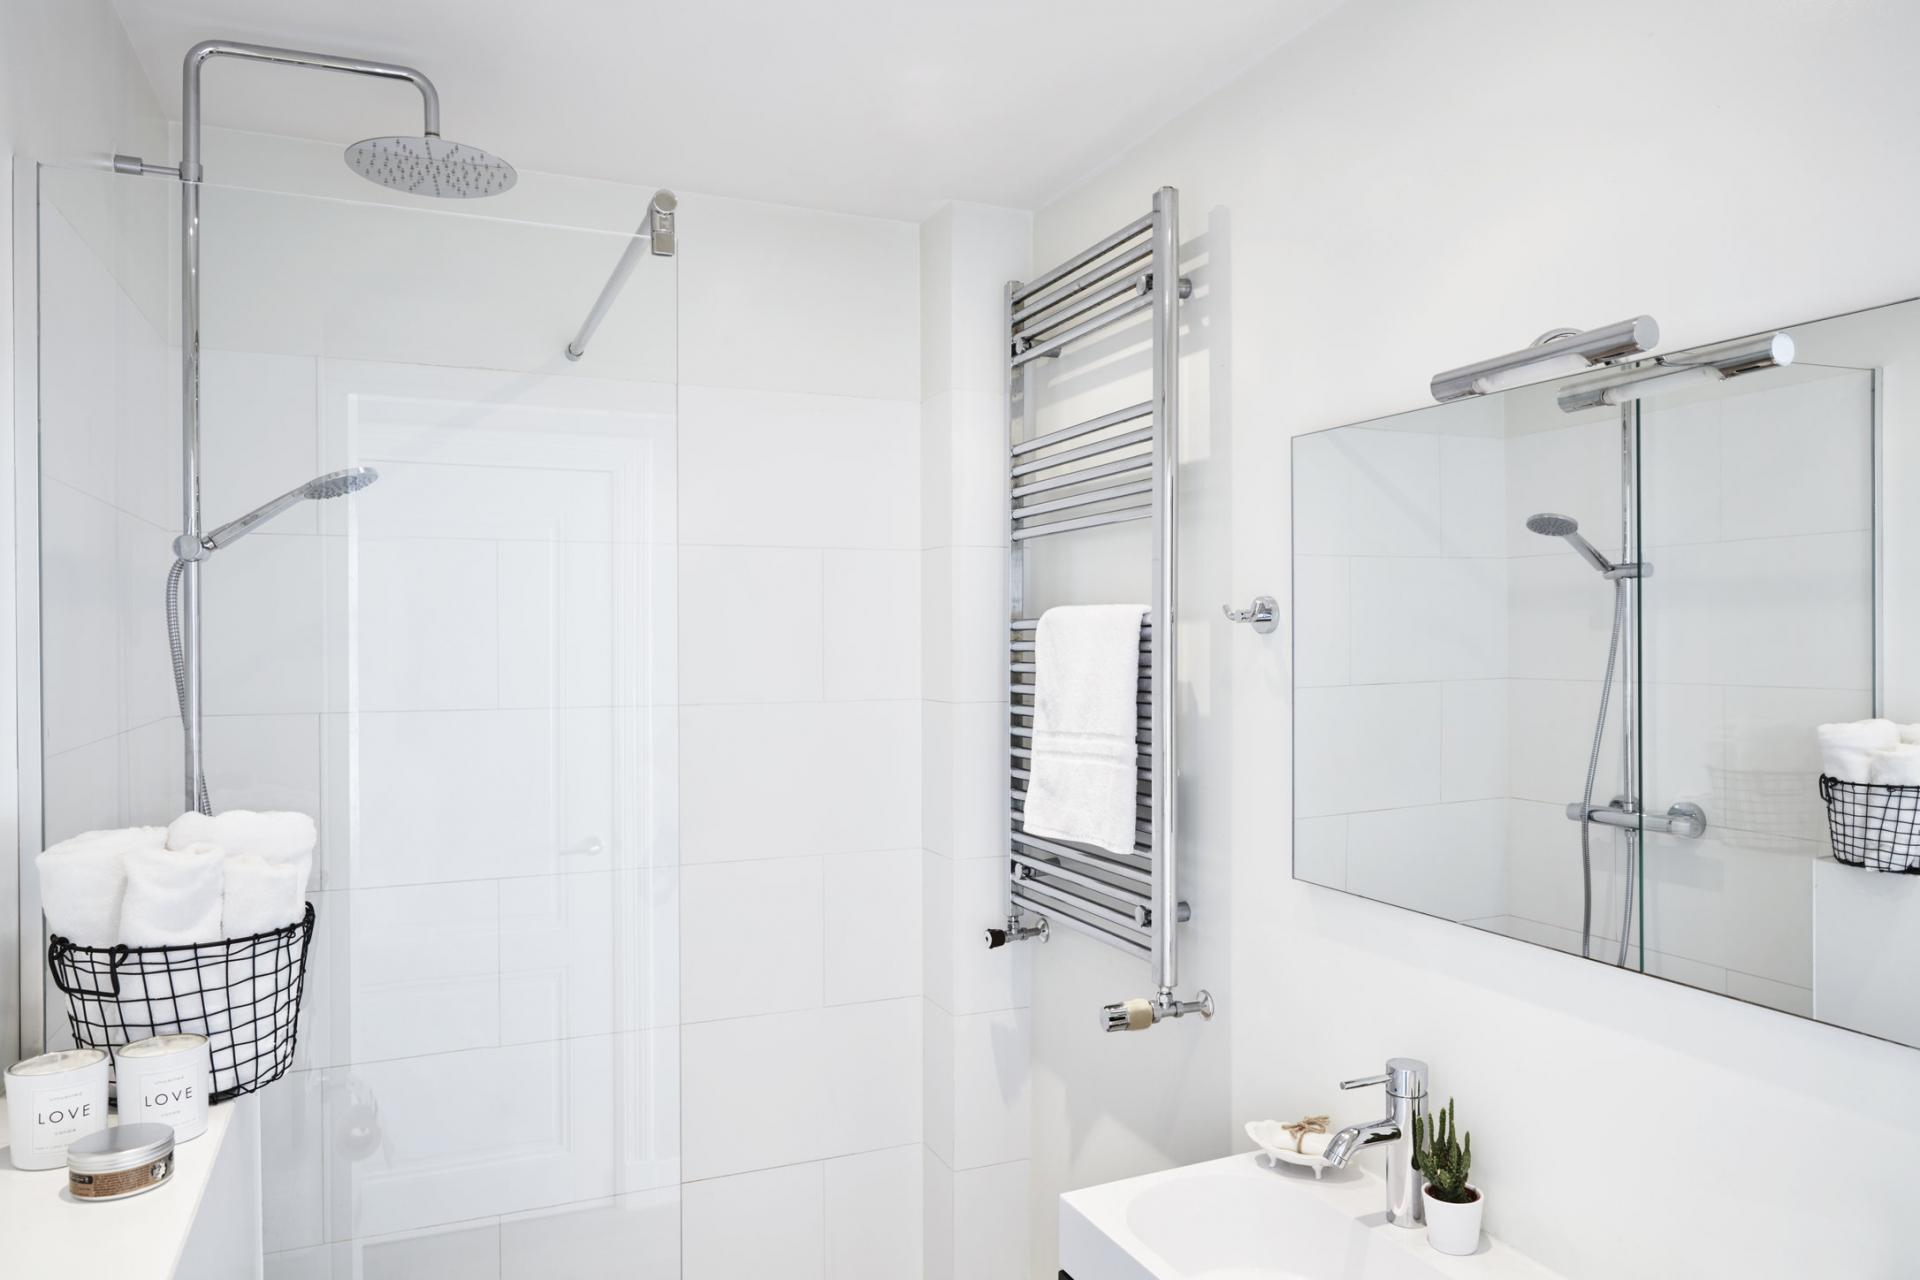 Bathroom at Old Center Apartments, Amsterdam - Cityden